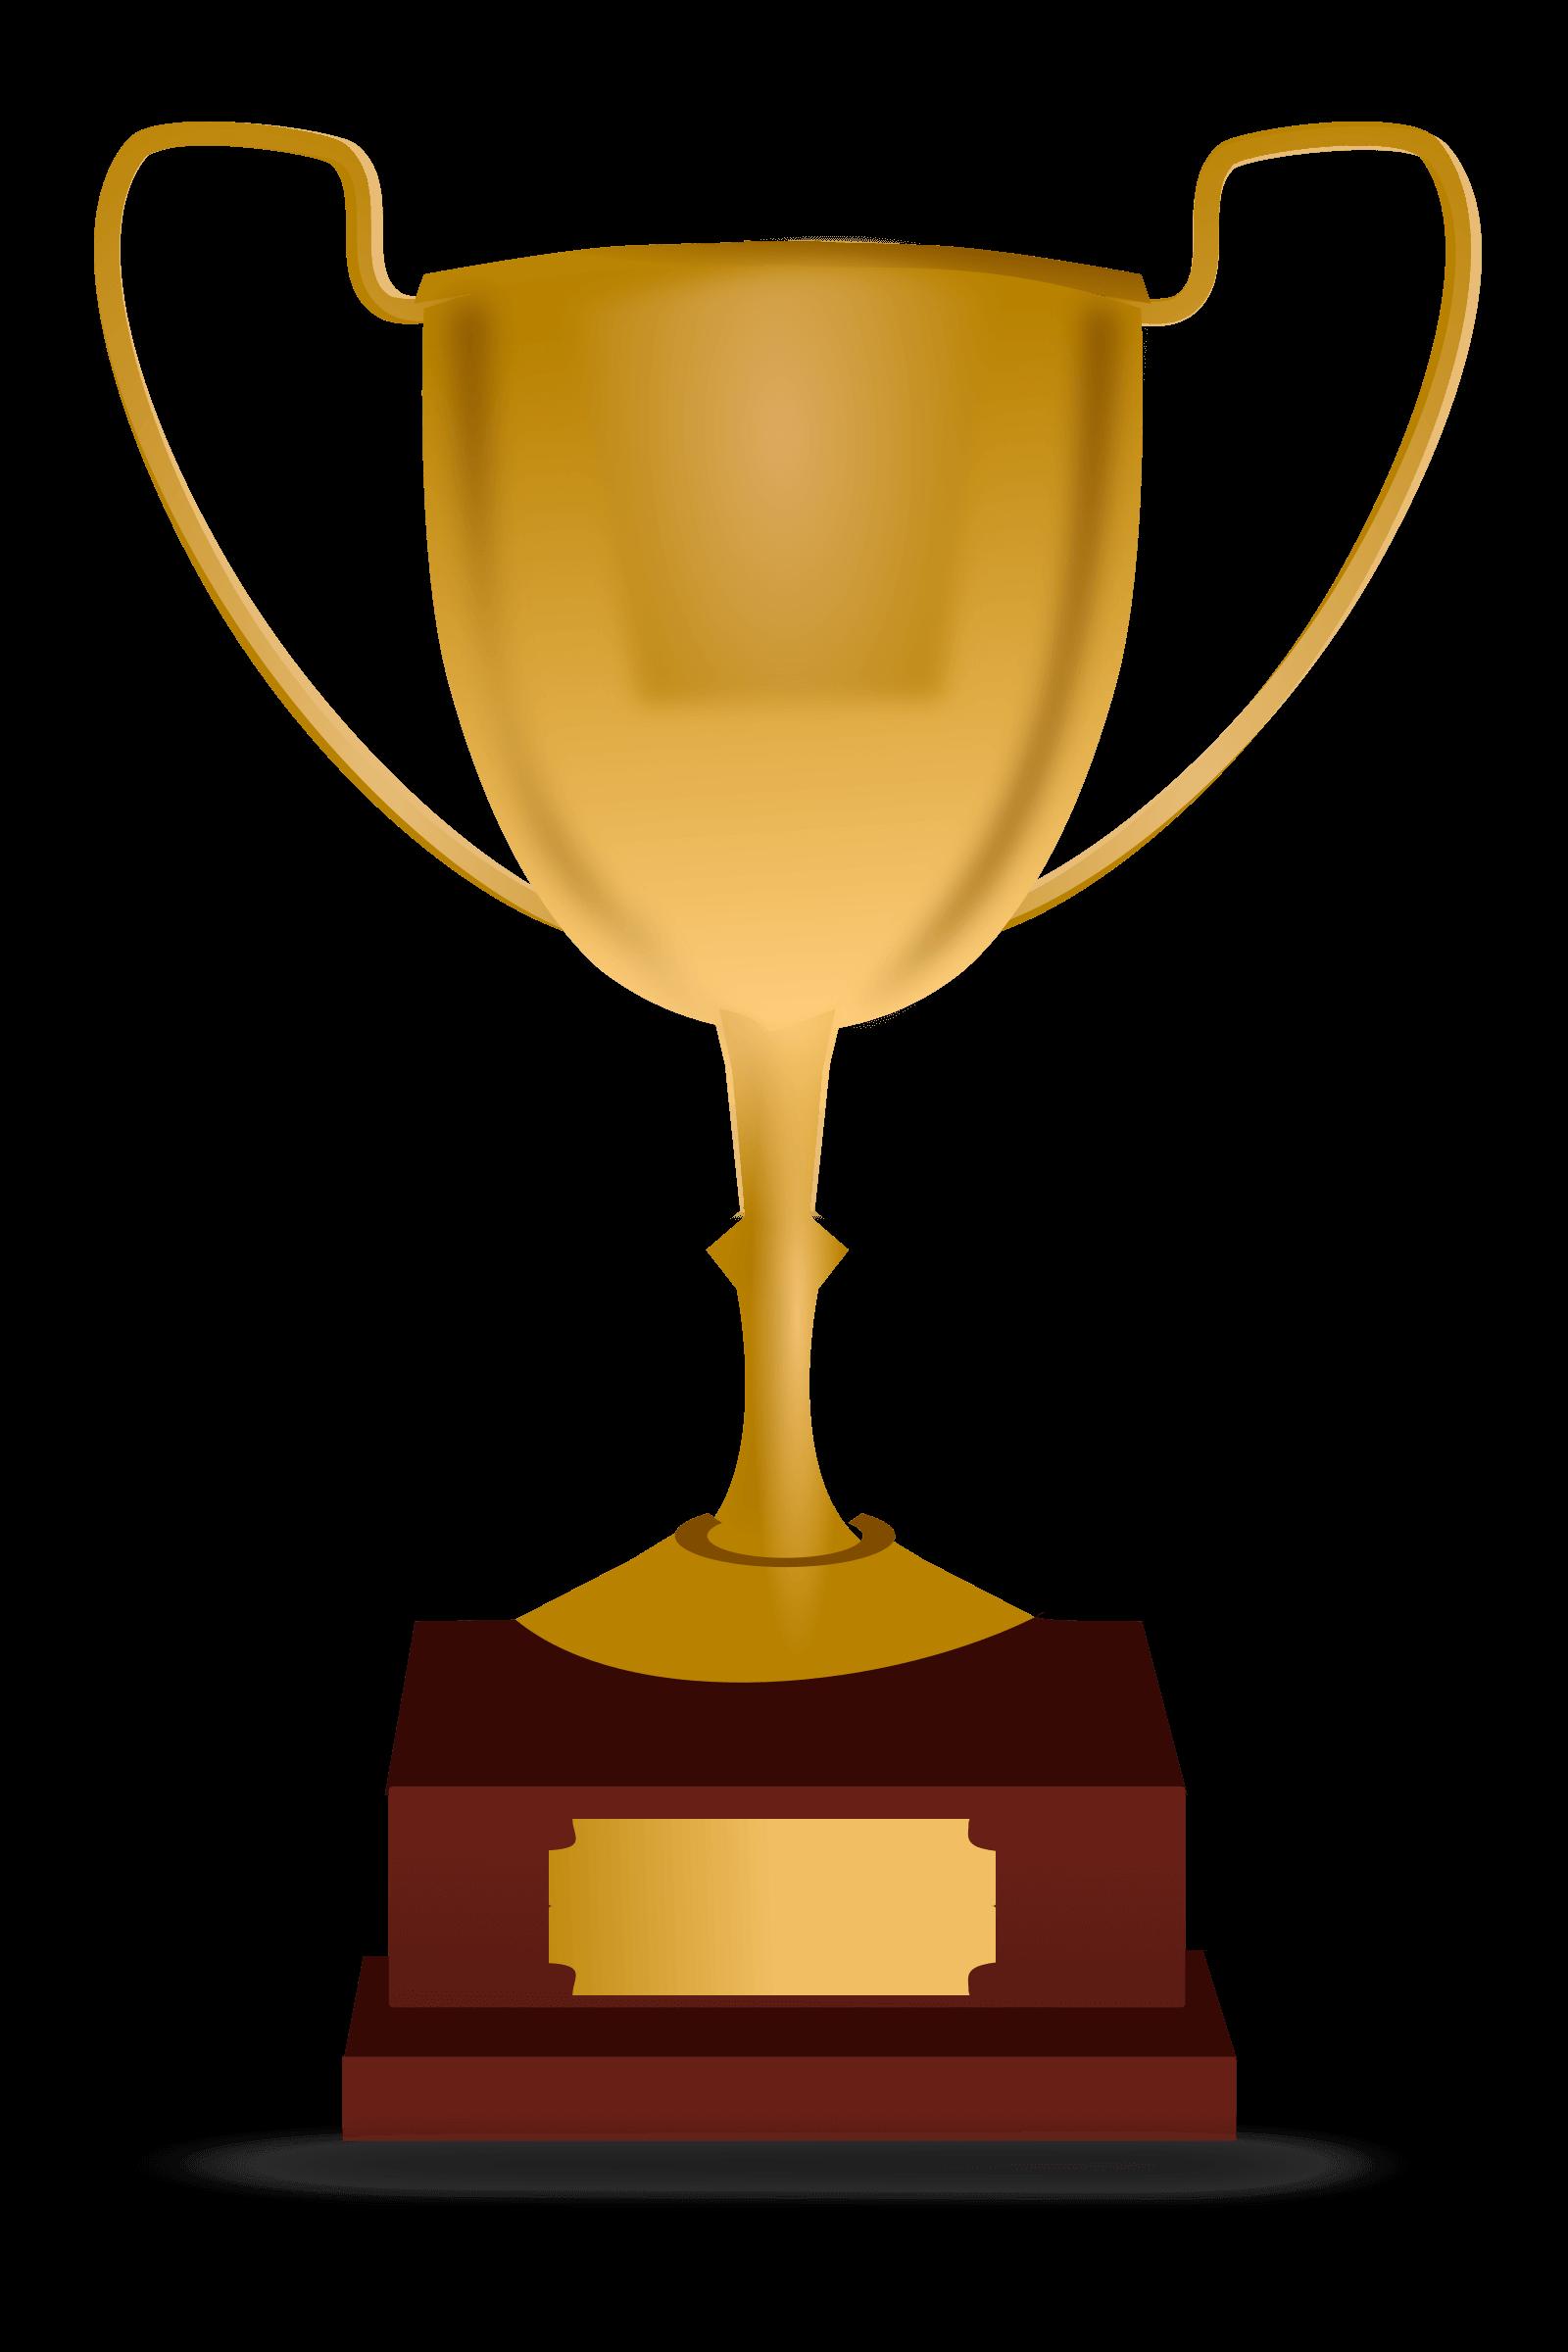 Gold trophy template free. Plaque clipart trophie